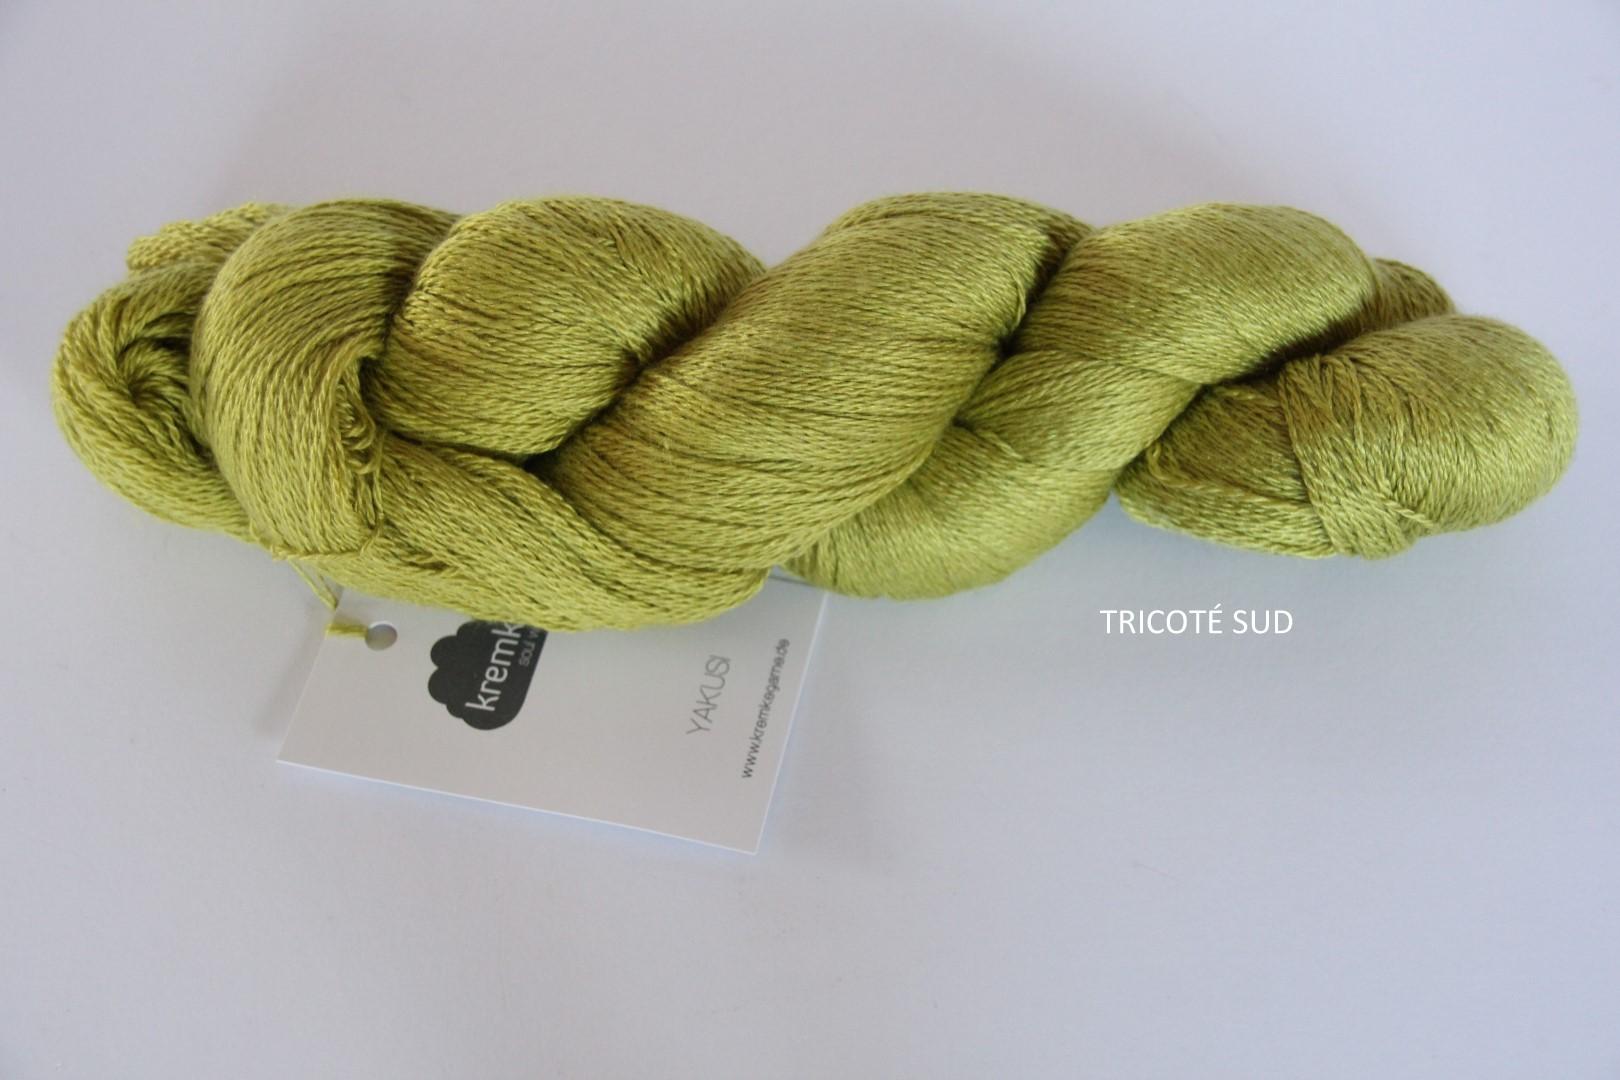 YAKUSI COLORIS 15 (Large)